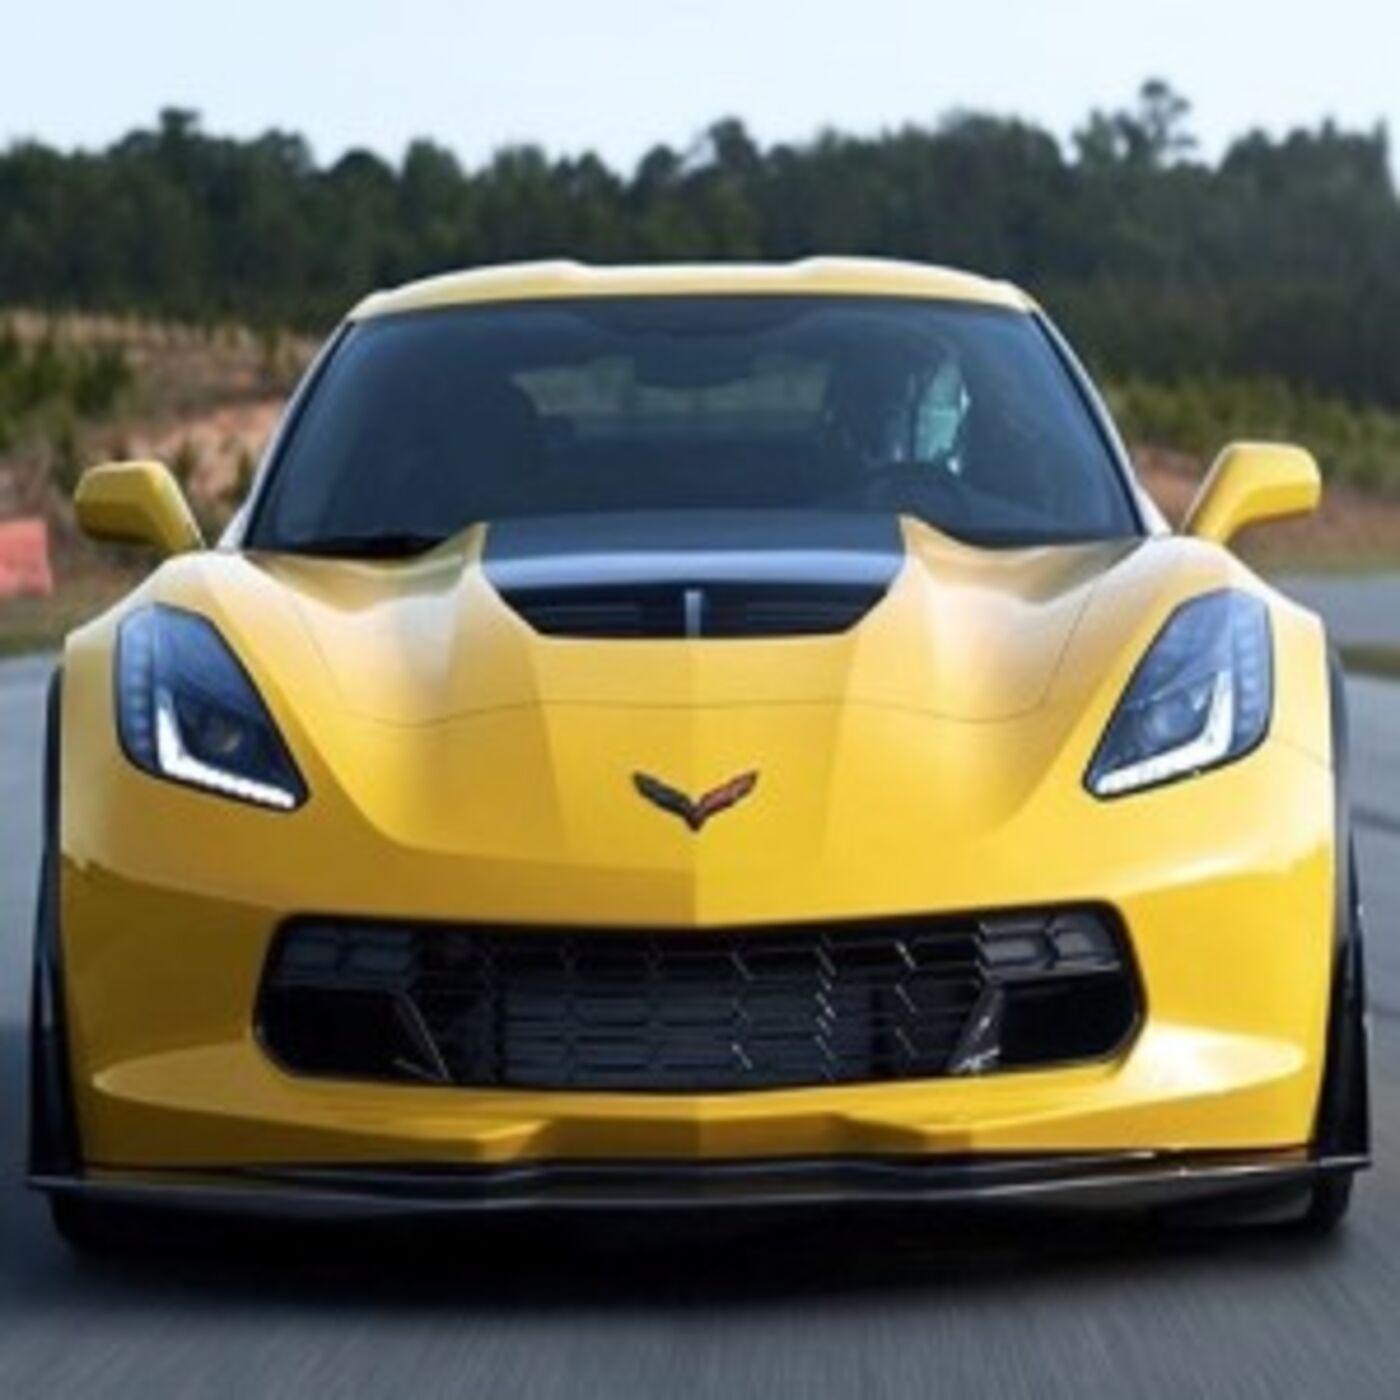 Styling Iconic Sports Cars: Mark Ferri, Designer of the Corvette Stingray